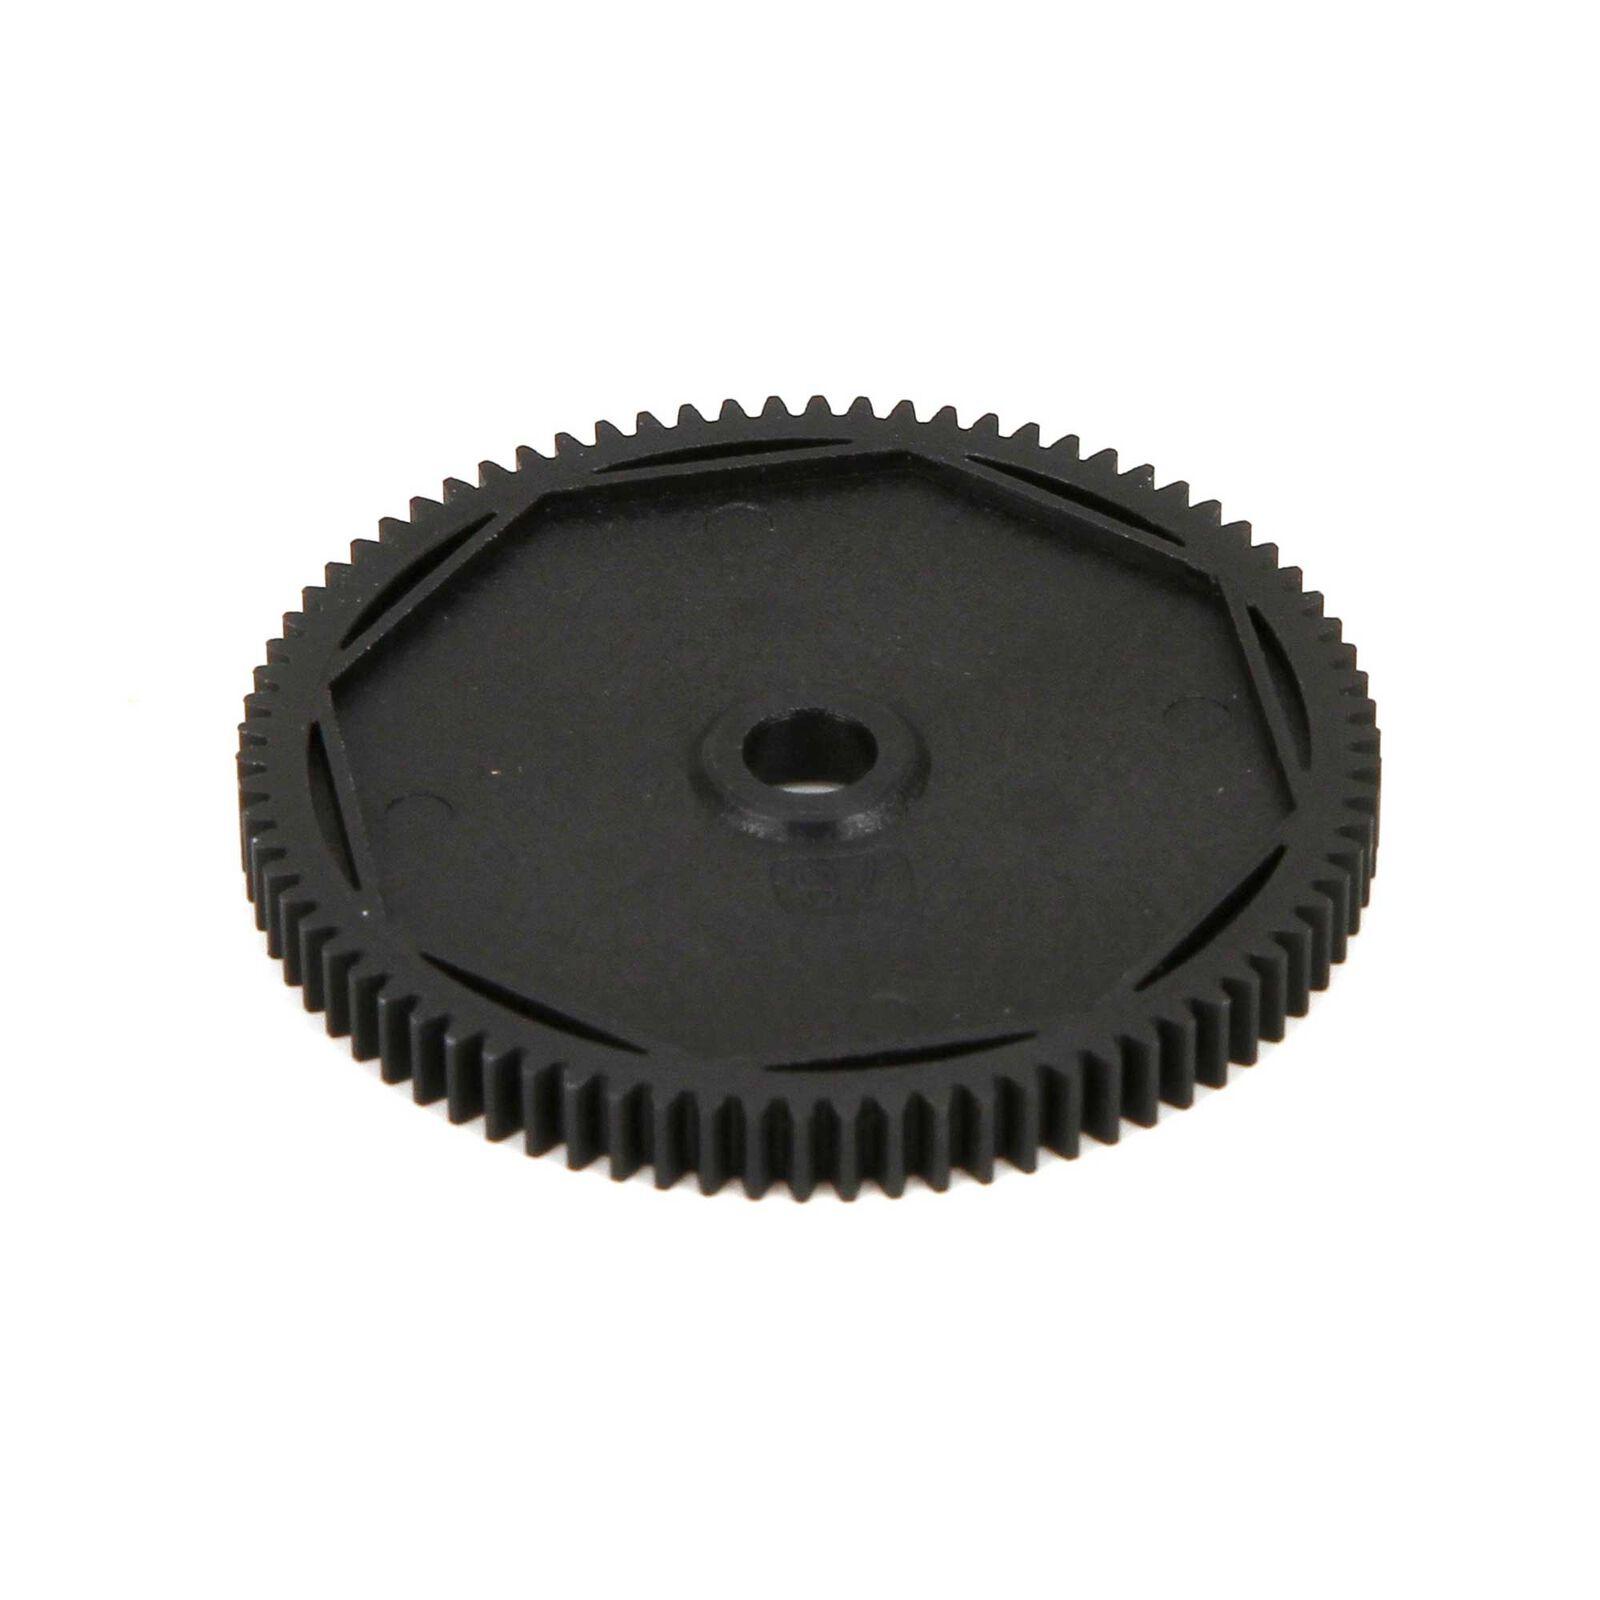 HDS Spur Gear, 78T 48P, Kevlar: All 22